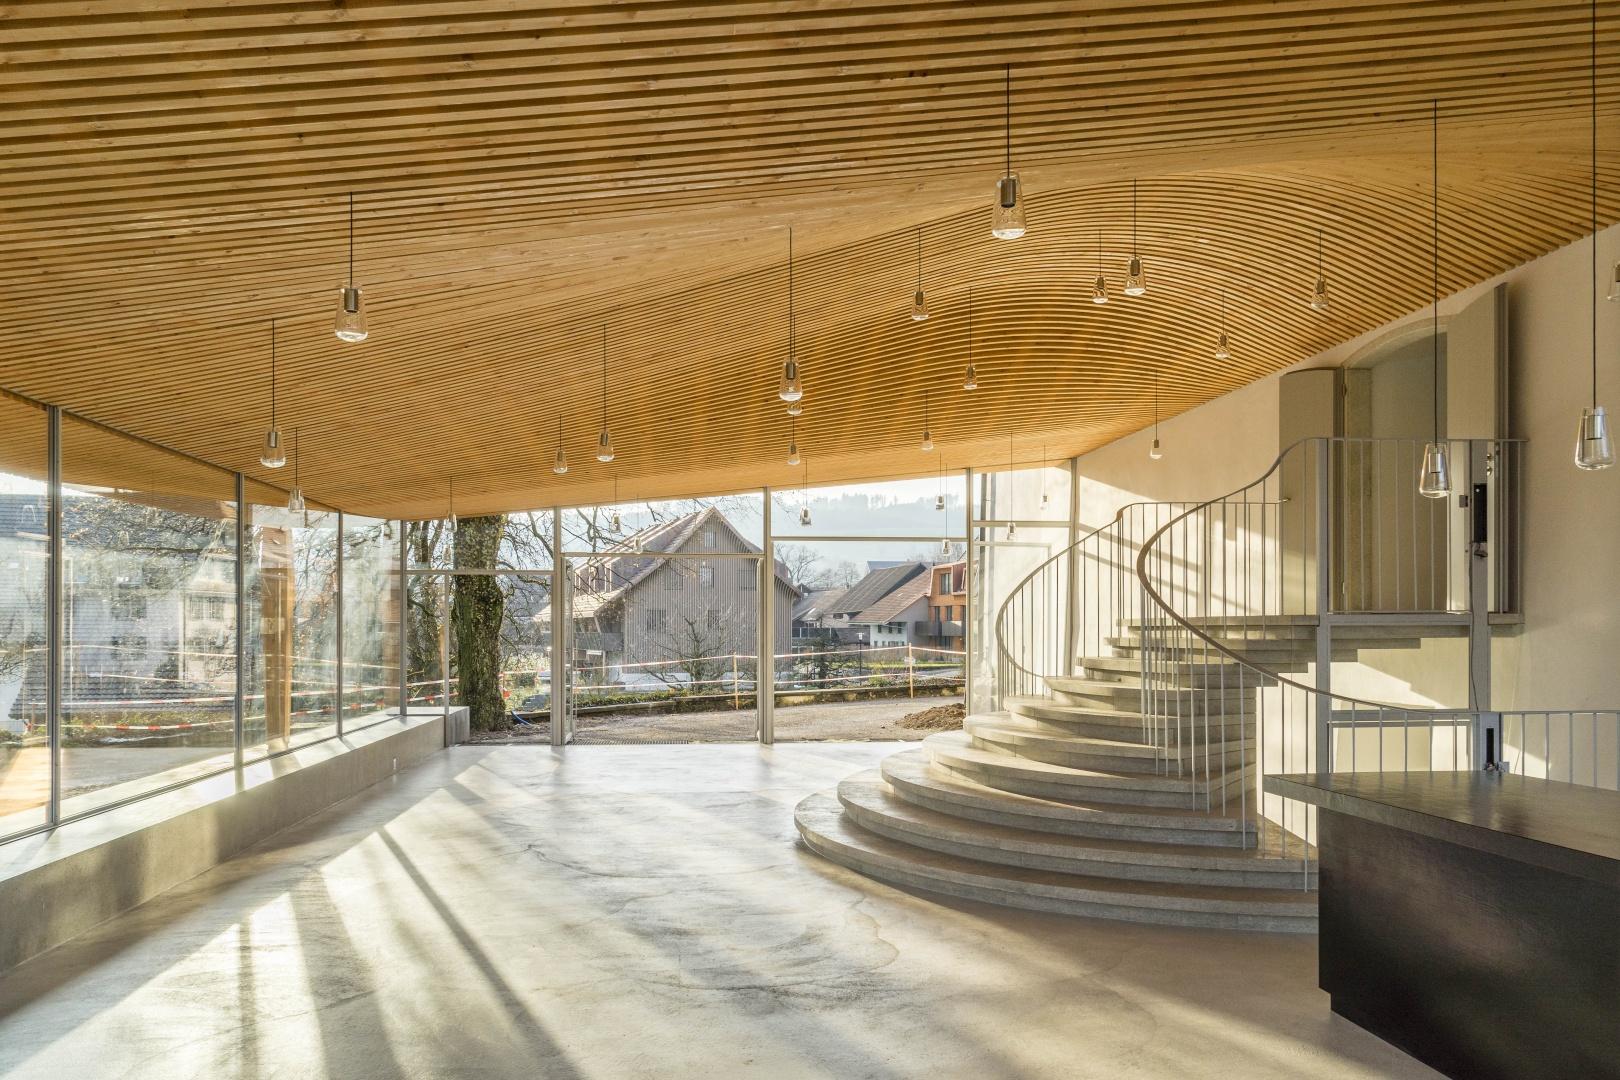 Foyer Künstlerhaus Boswil, Innenraum © Gian Salis Architektur GmbH